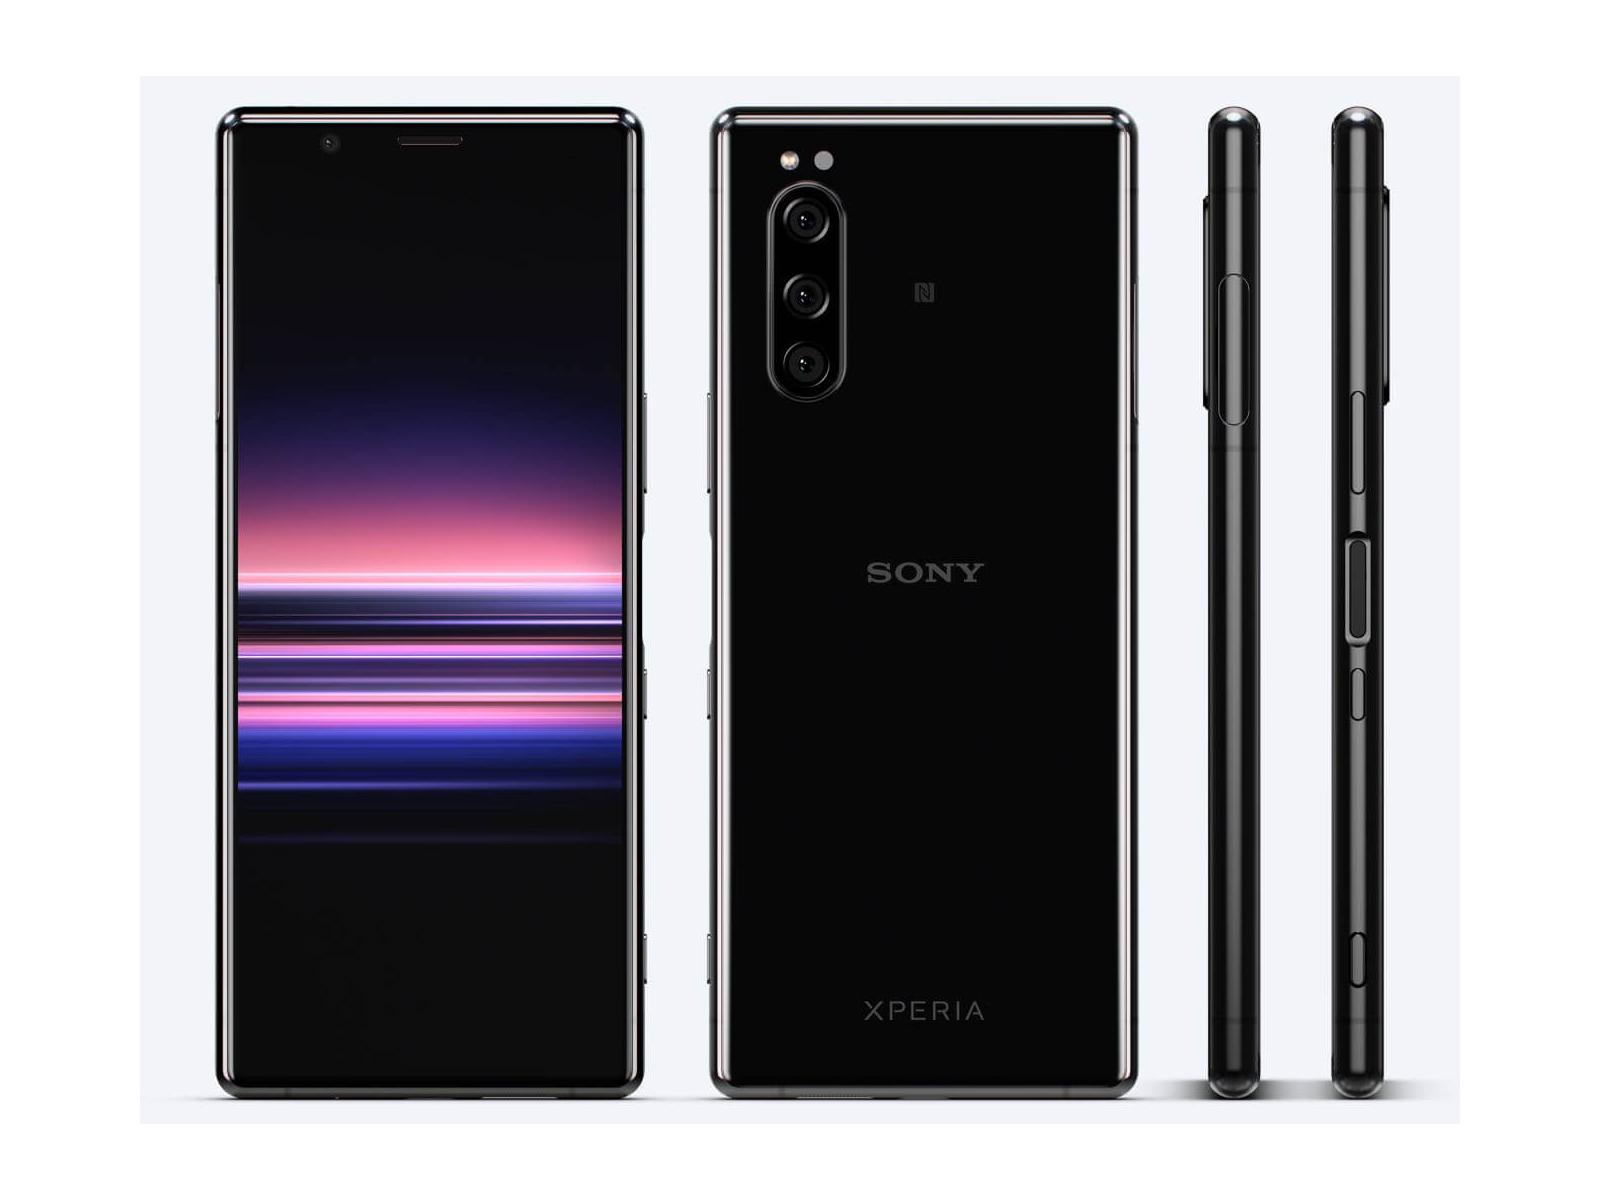 Sony Xperia 5 Notebookcheck.se